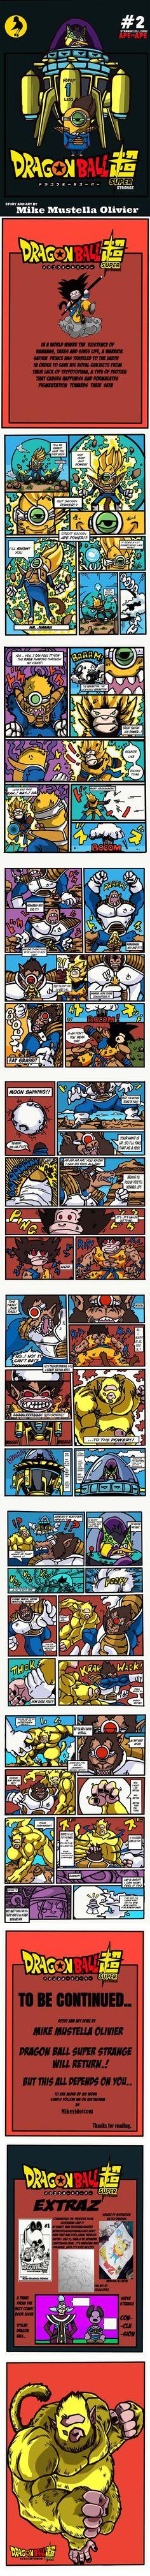 Dragon ball Z Super Strange Prince Warrior, Webtoon, Dragon Ball Z, Fantasy, Dragon Dall Z, Fantasy Movies, Fantasia, Dragonball Z